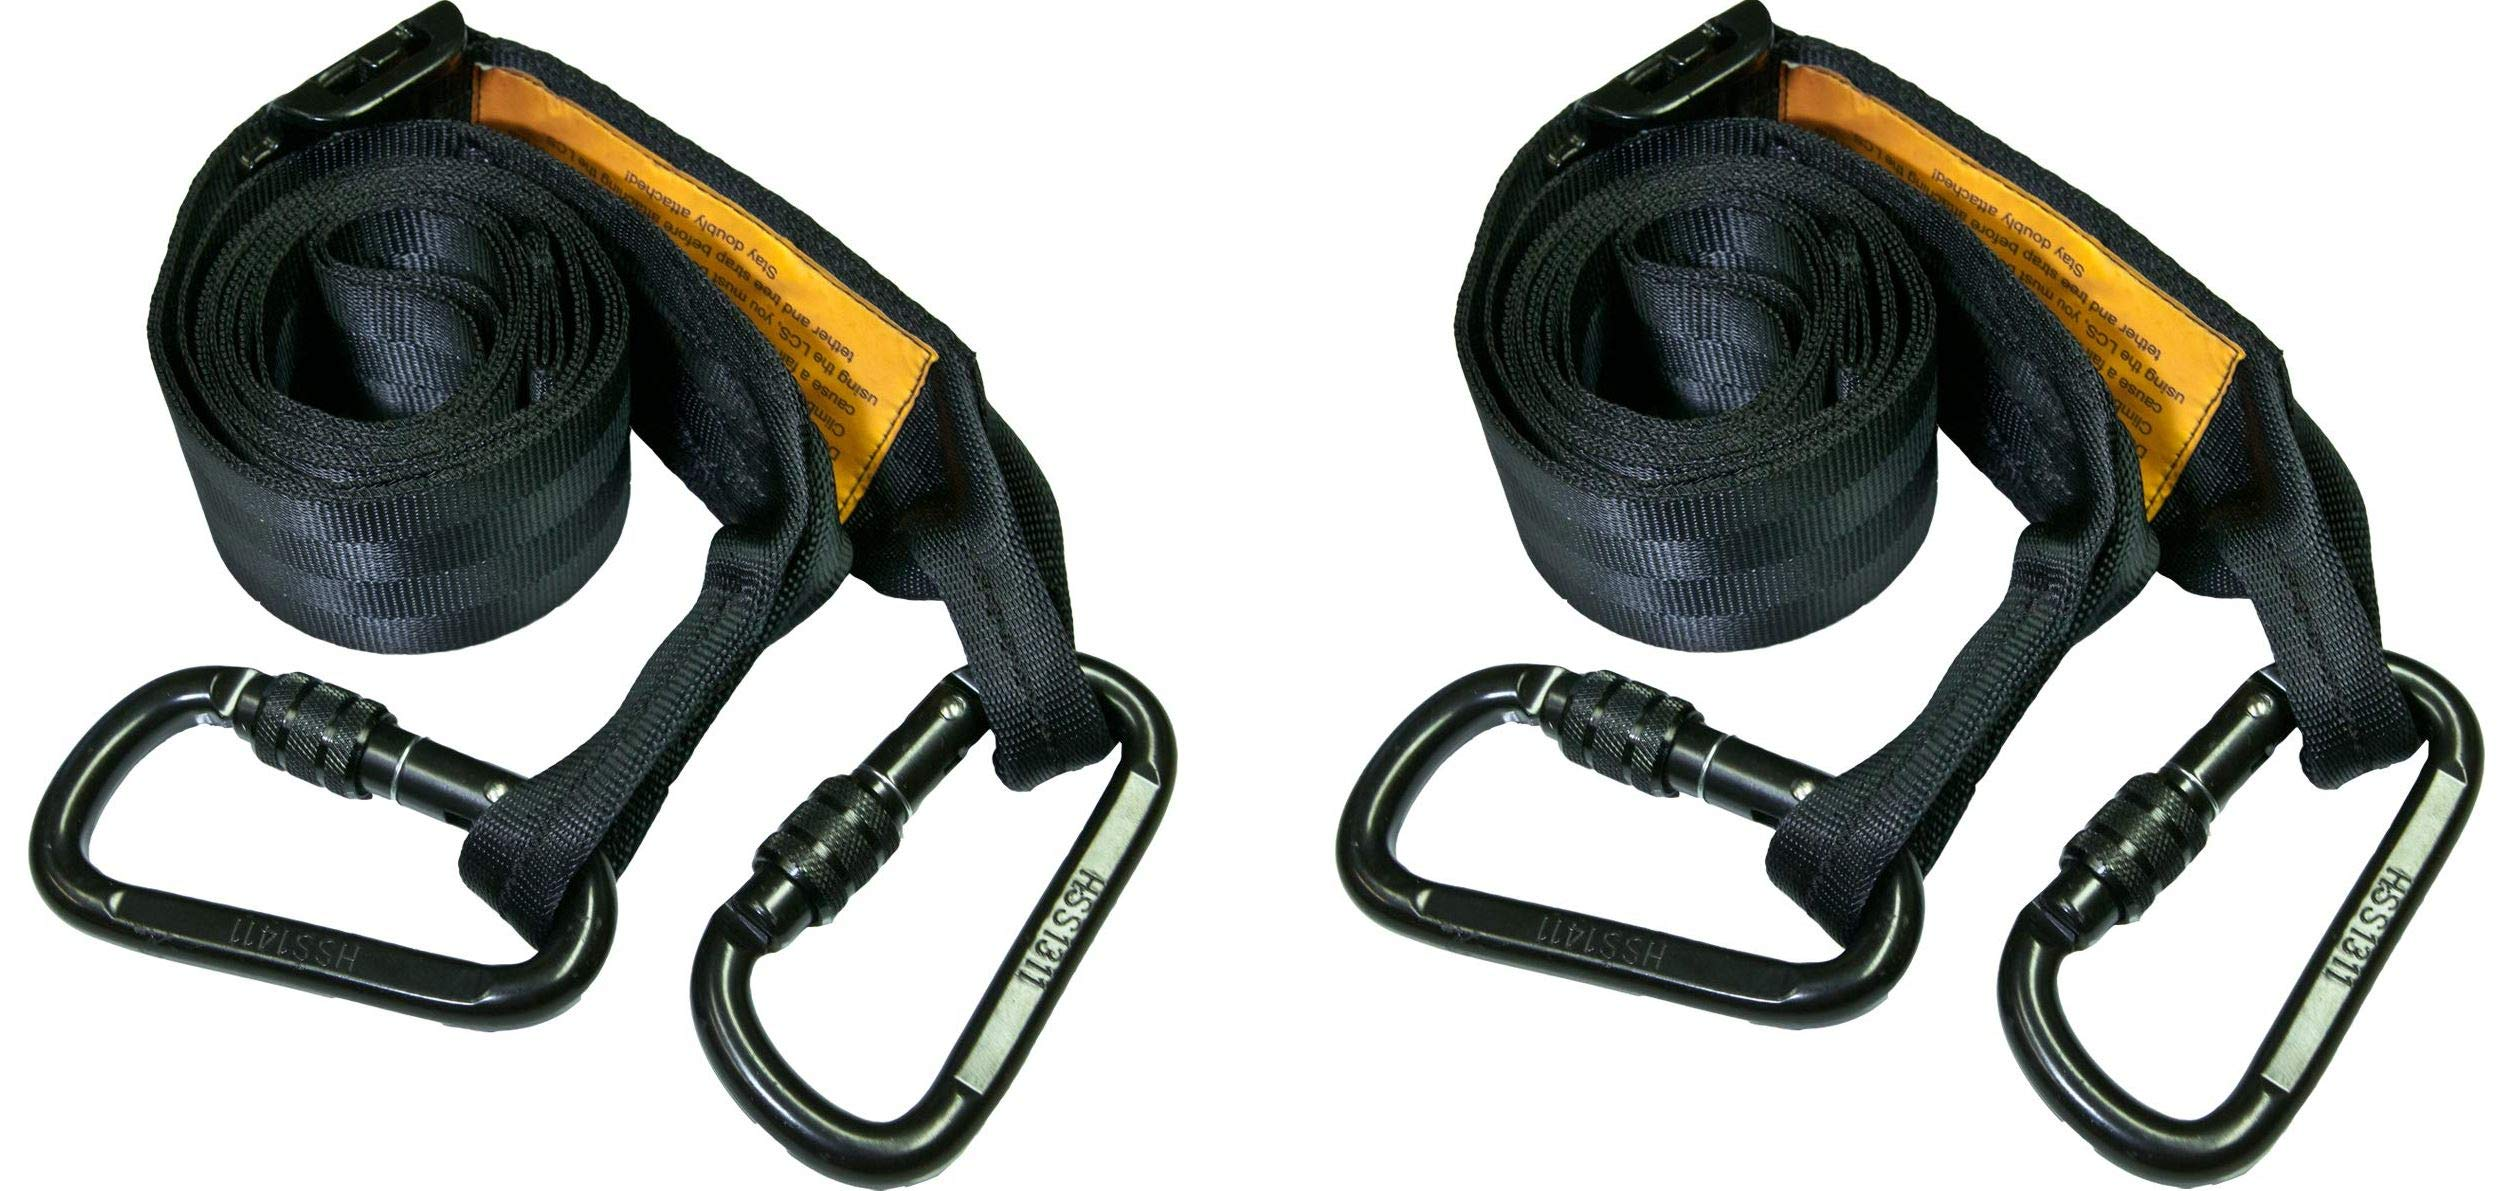 Hunter Safety System LCS Lineman's Climbing Strap (Twо Pаck)